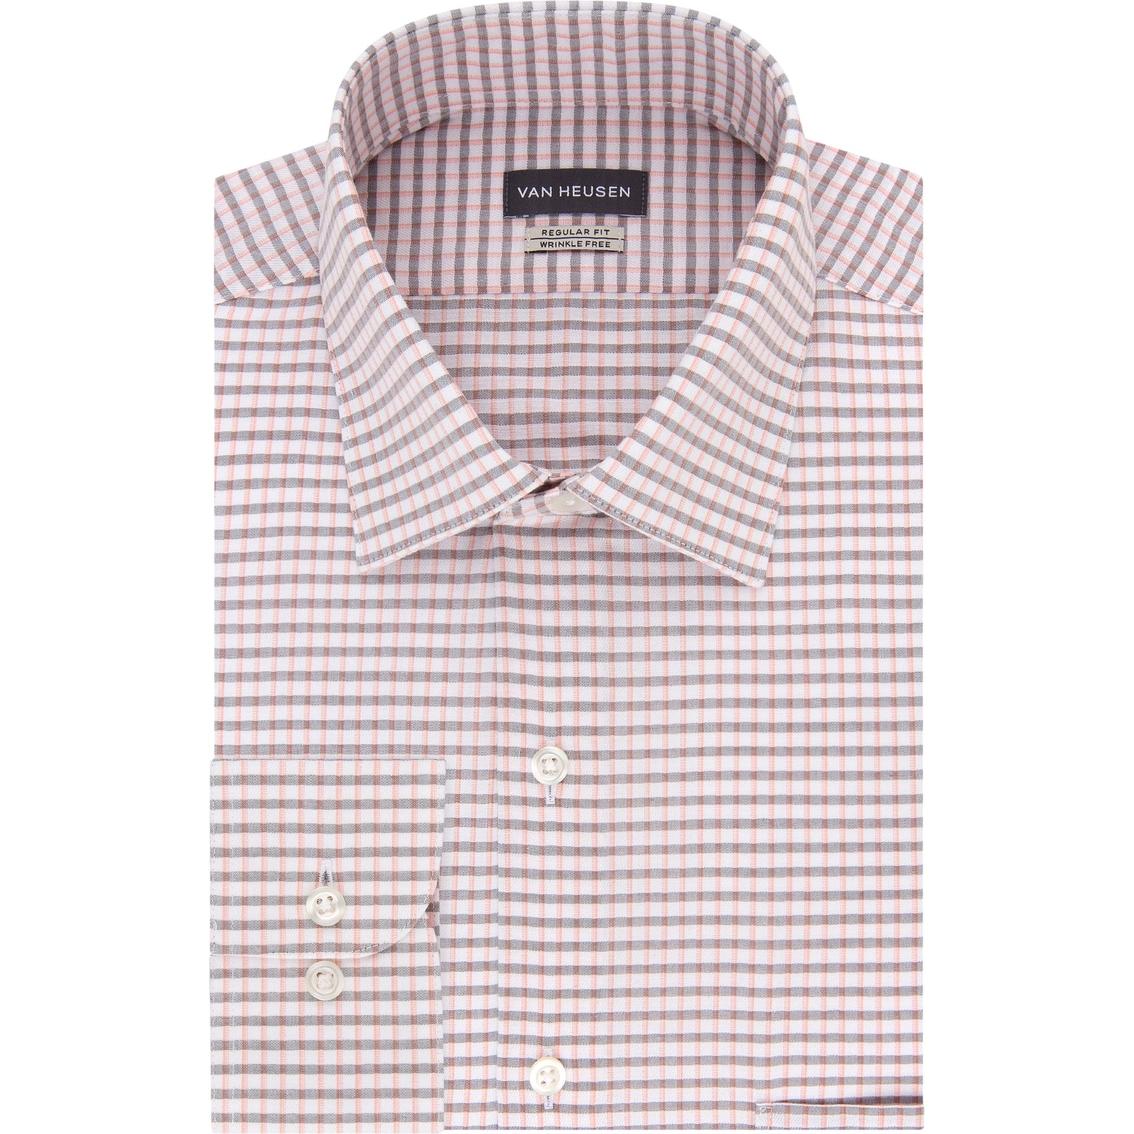 Van Heusen Dress Shirts Reviews